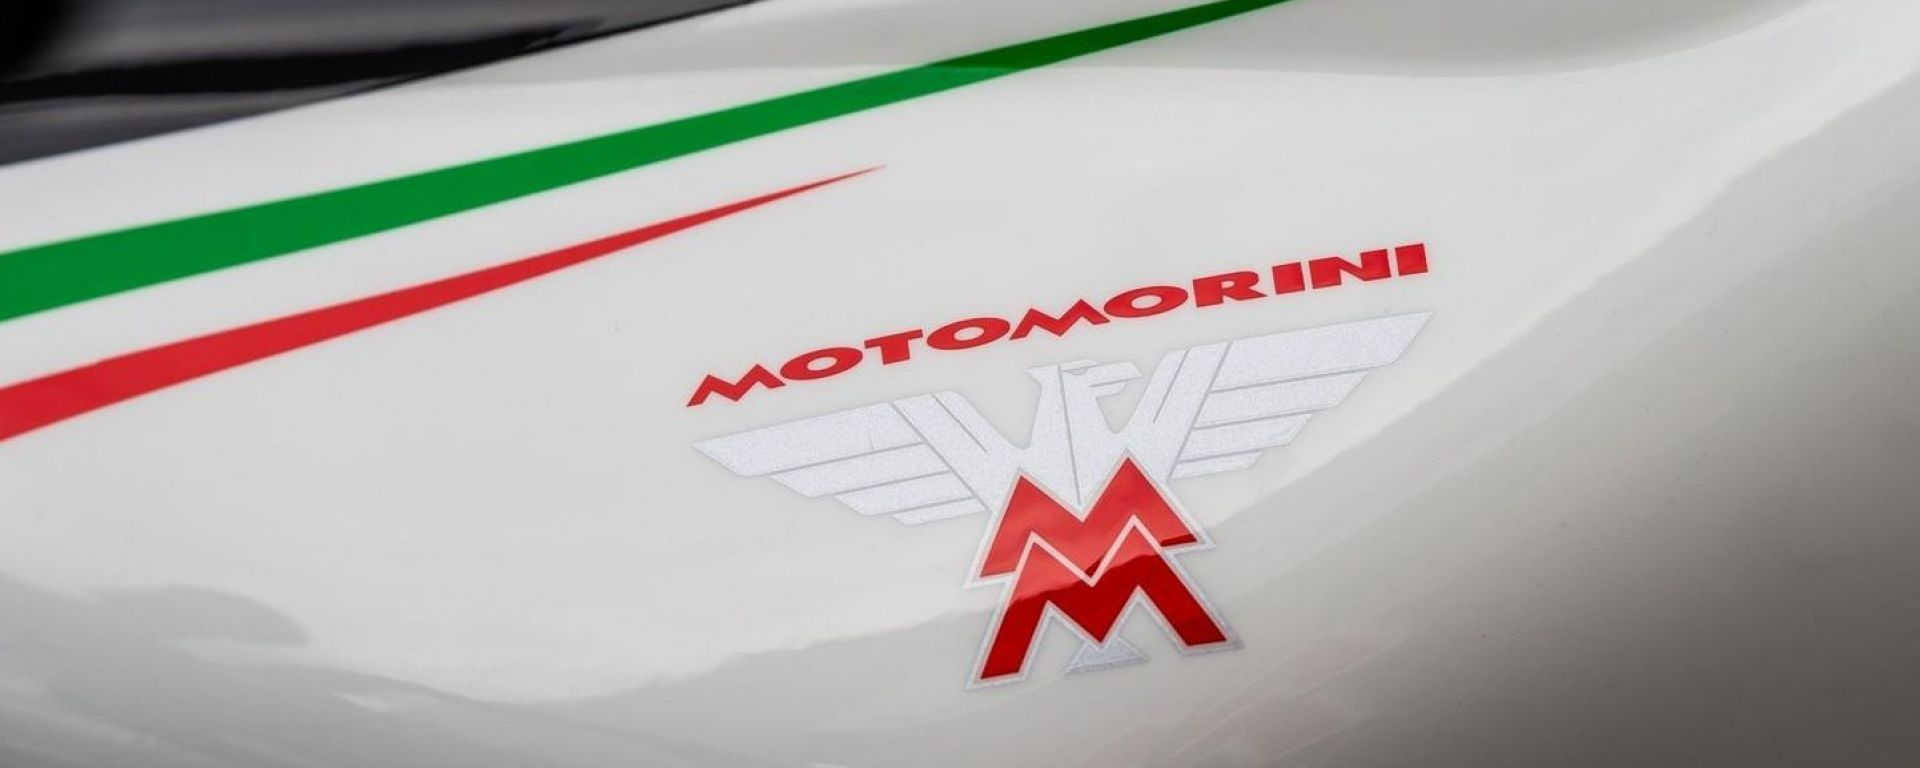 Moto Morini passa ai cinesi di Zhongneng per 10 milioni